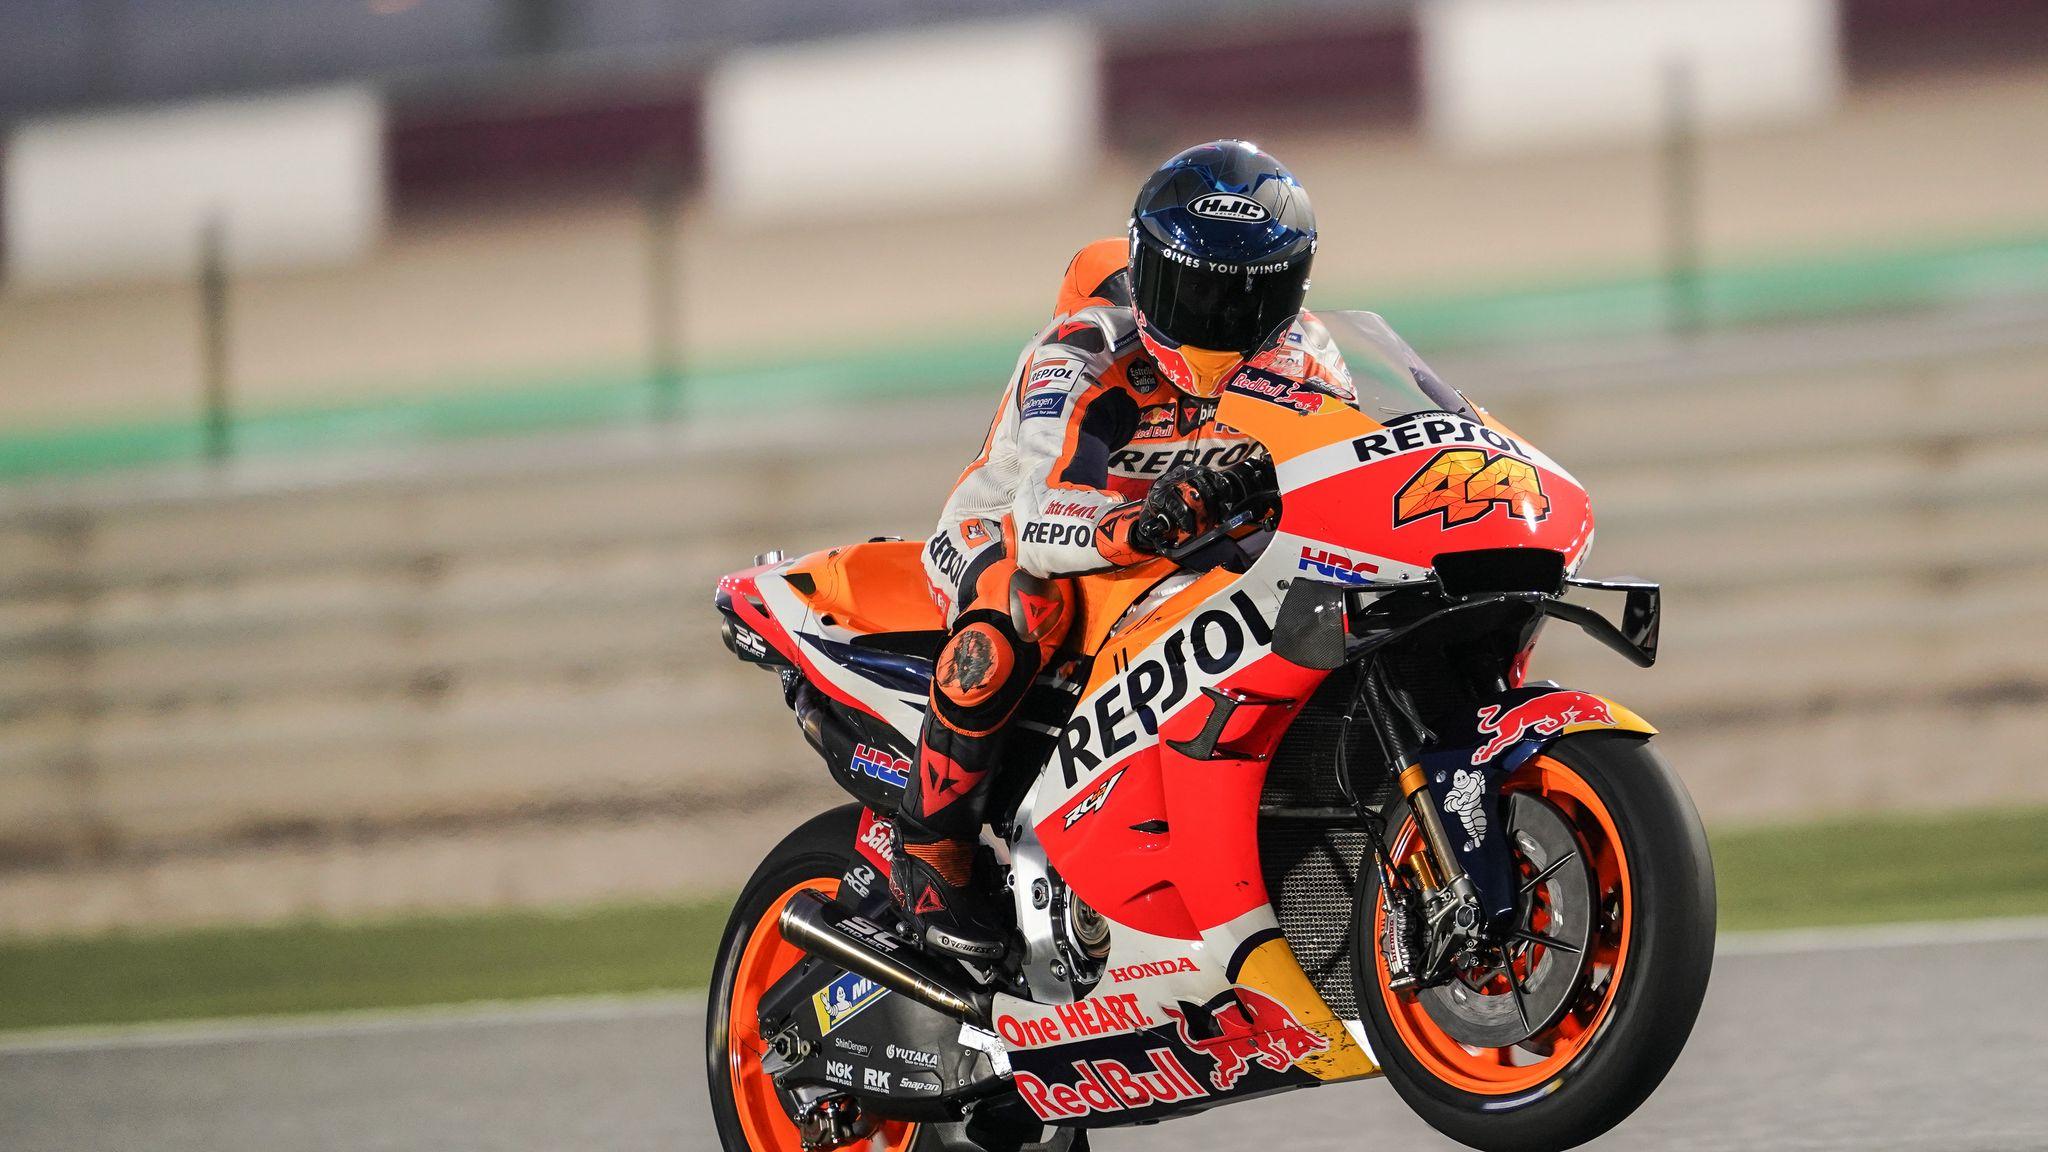 2048x1152 Wallpaper honda, motorcycle, motorcyclist, helmet, speed, track, orange